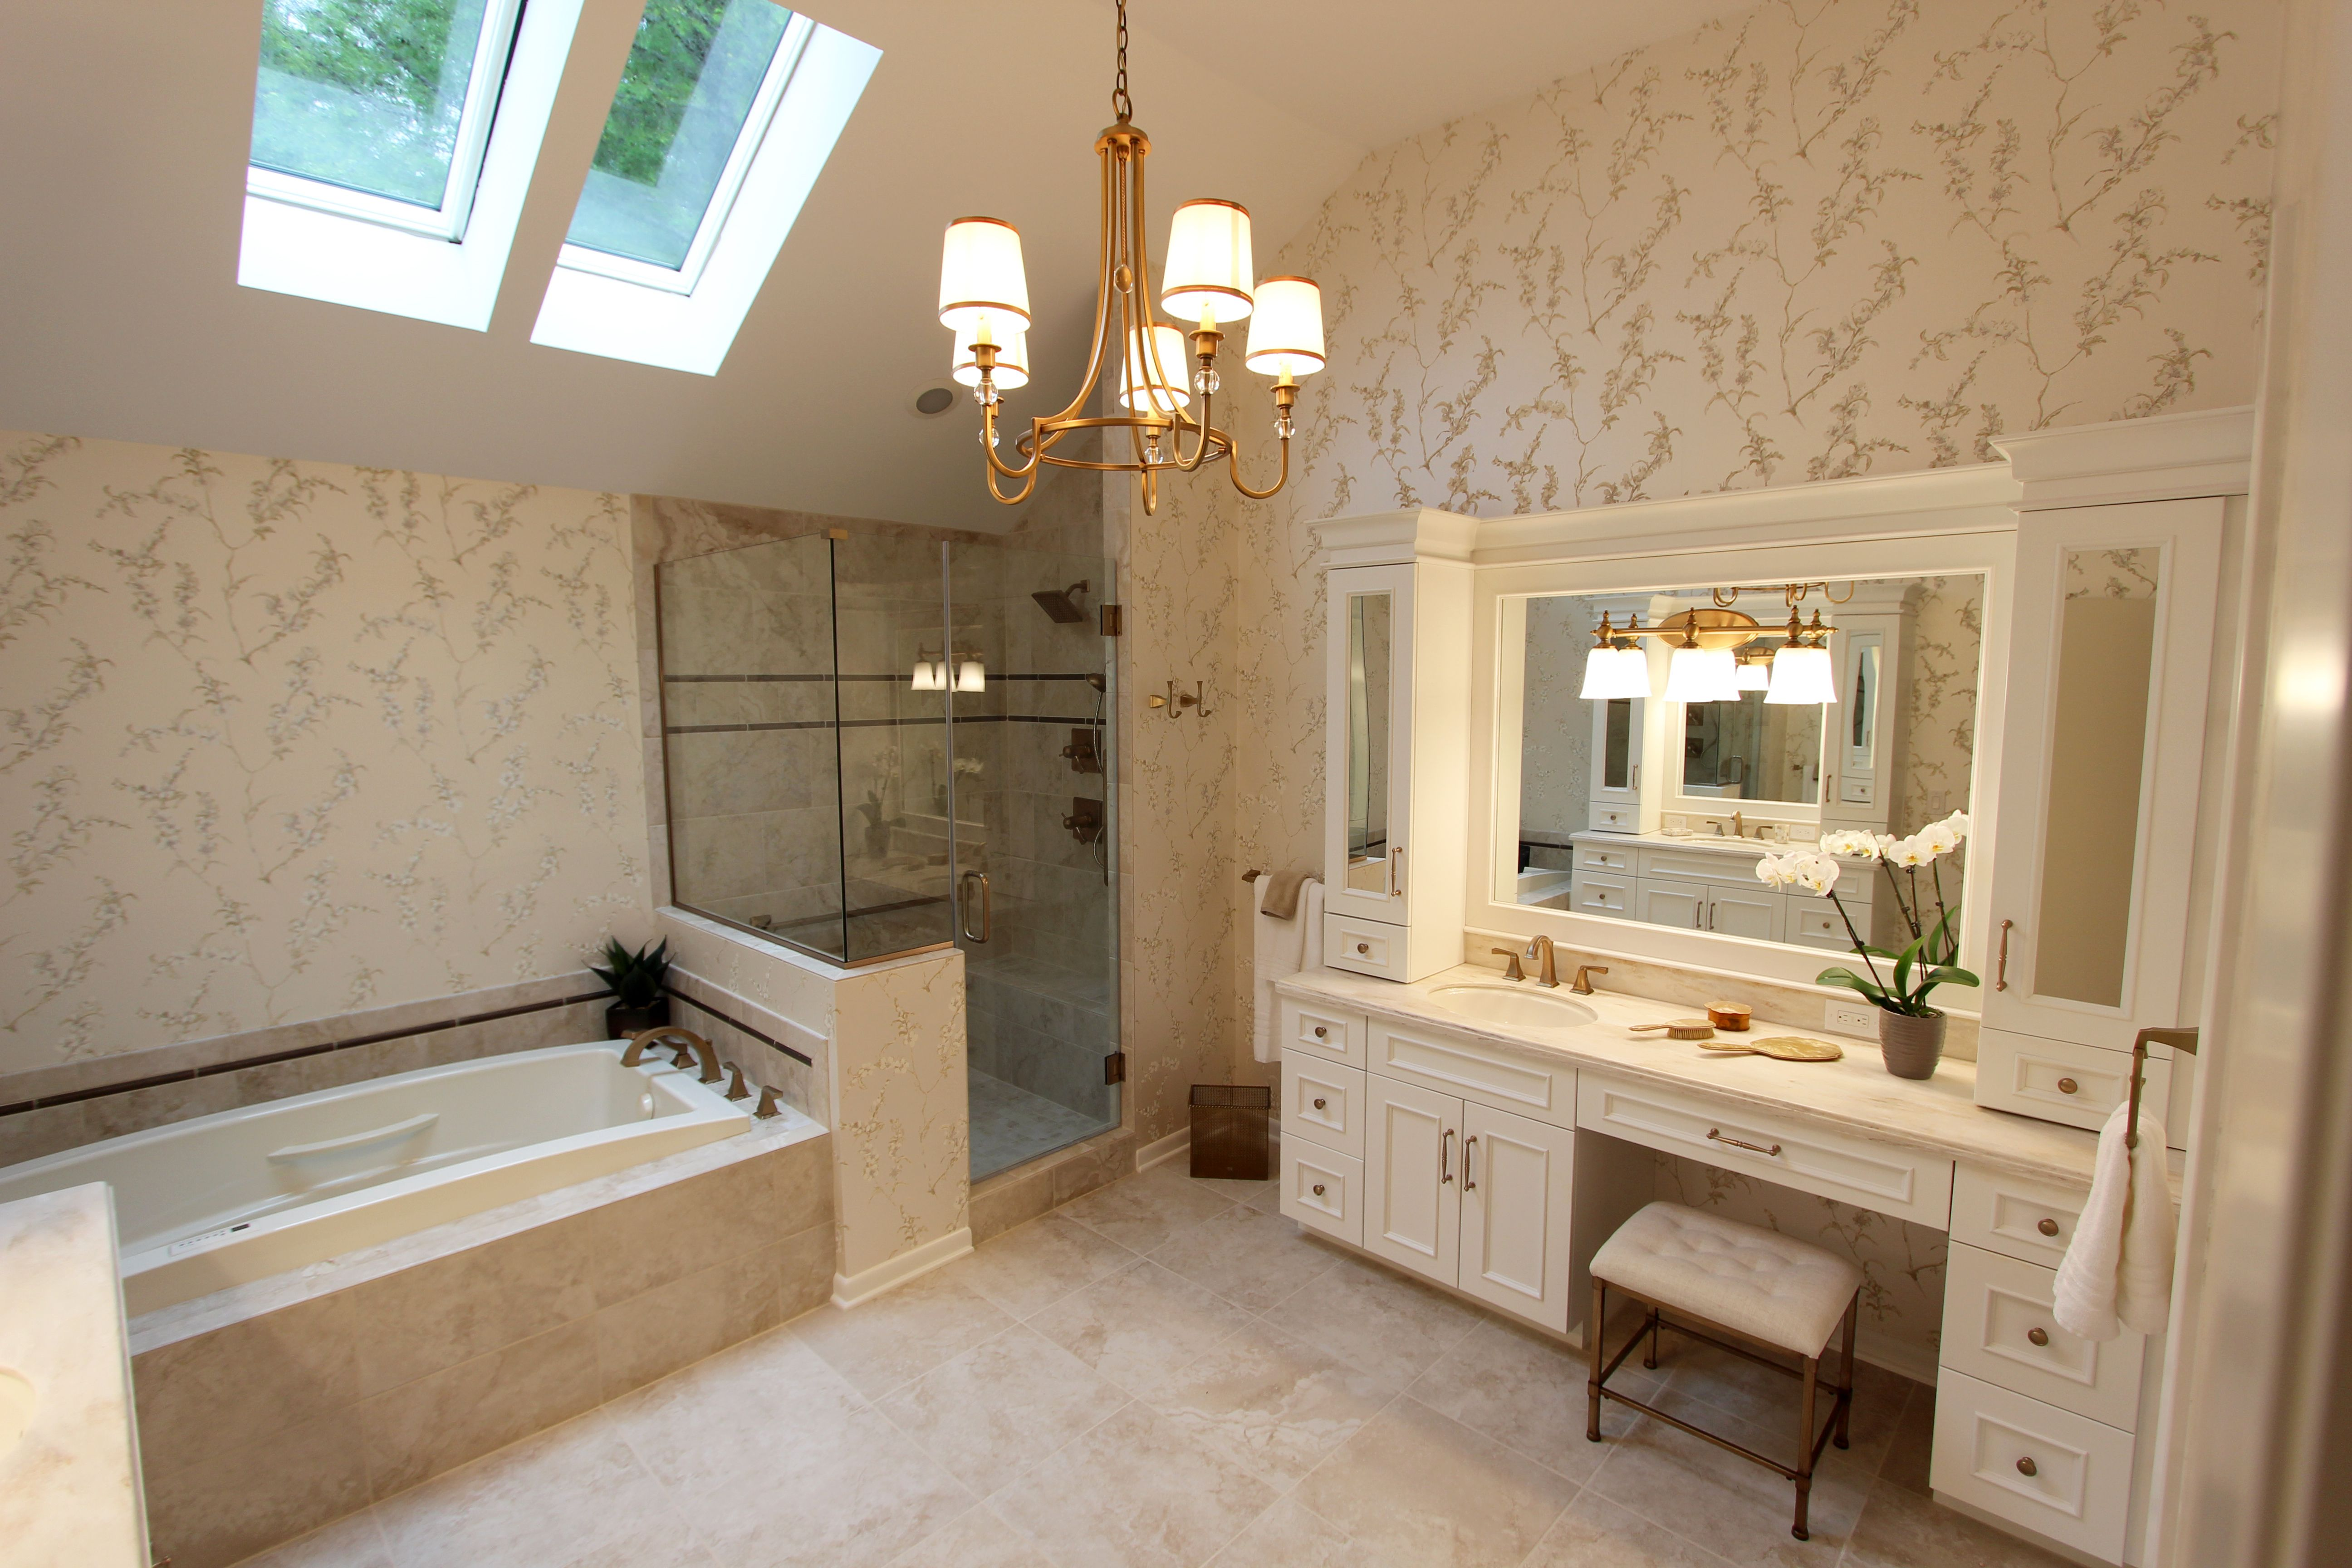 Bathroom Renovation Newcastle in this master bath renovation, we installed design-craft